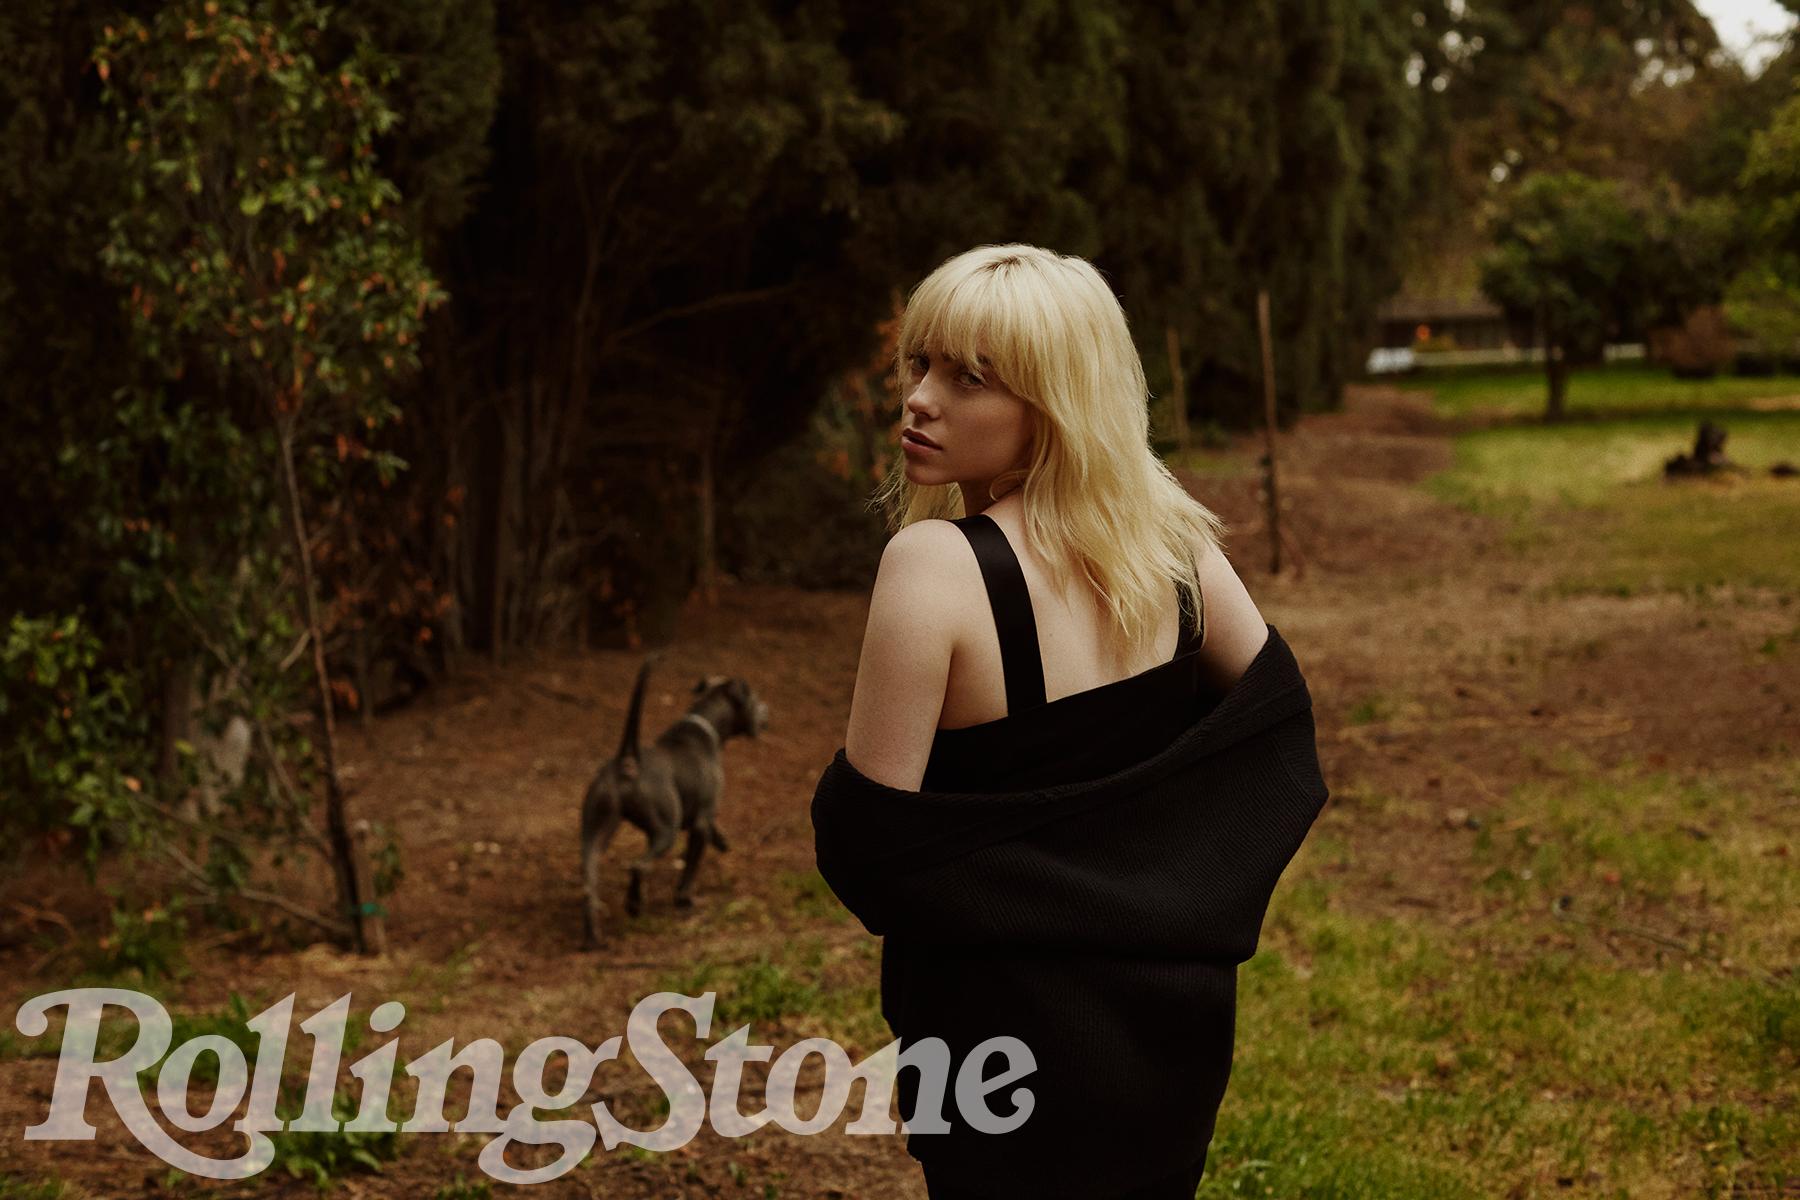 Billie Eilish Rolling Stone July Issue Details